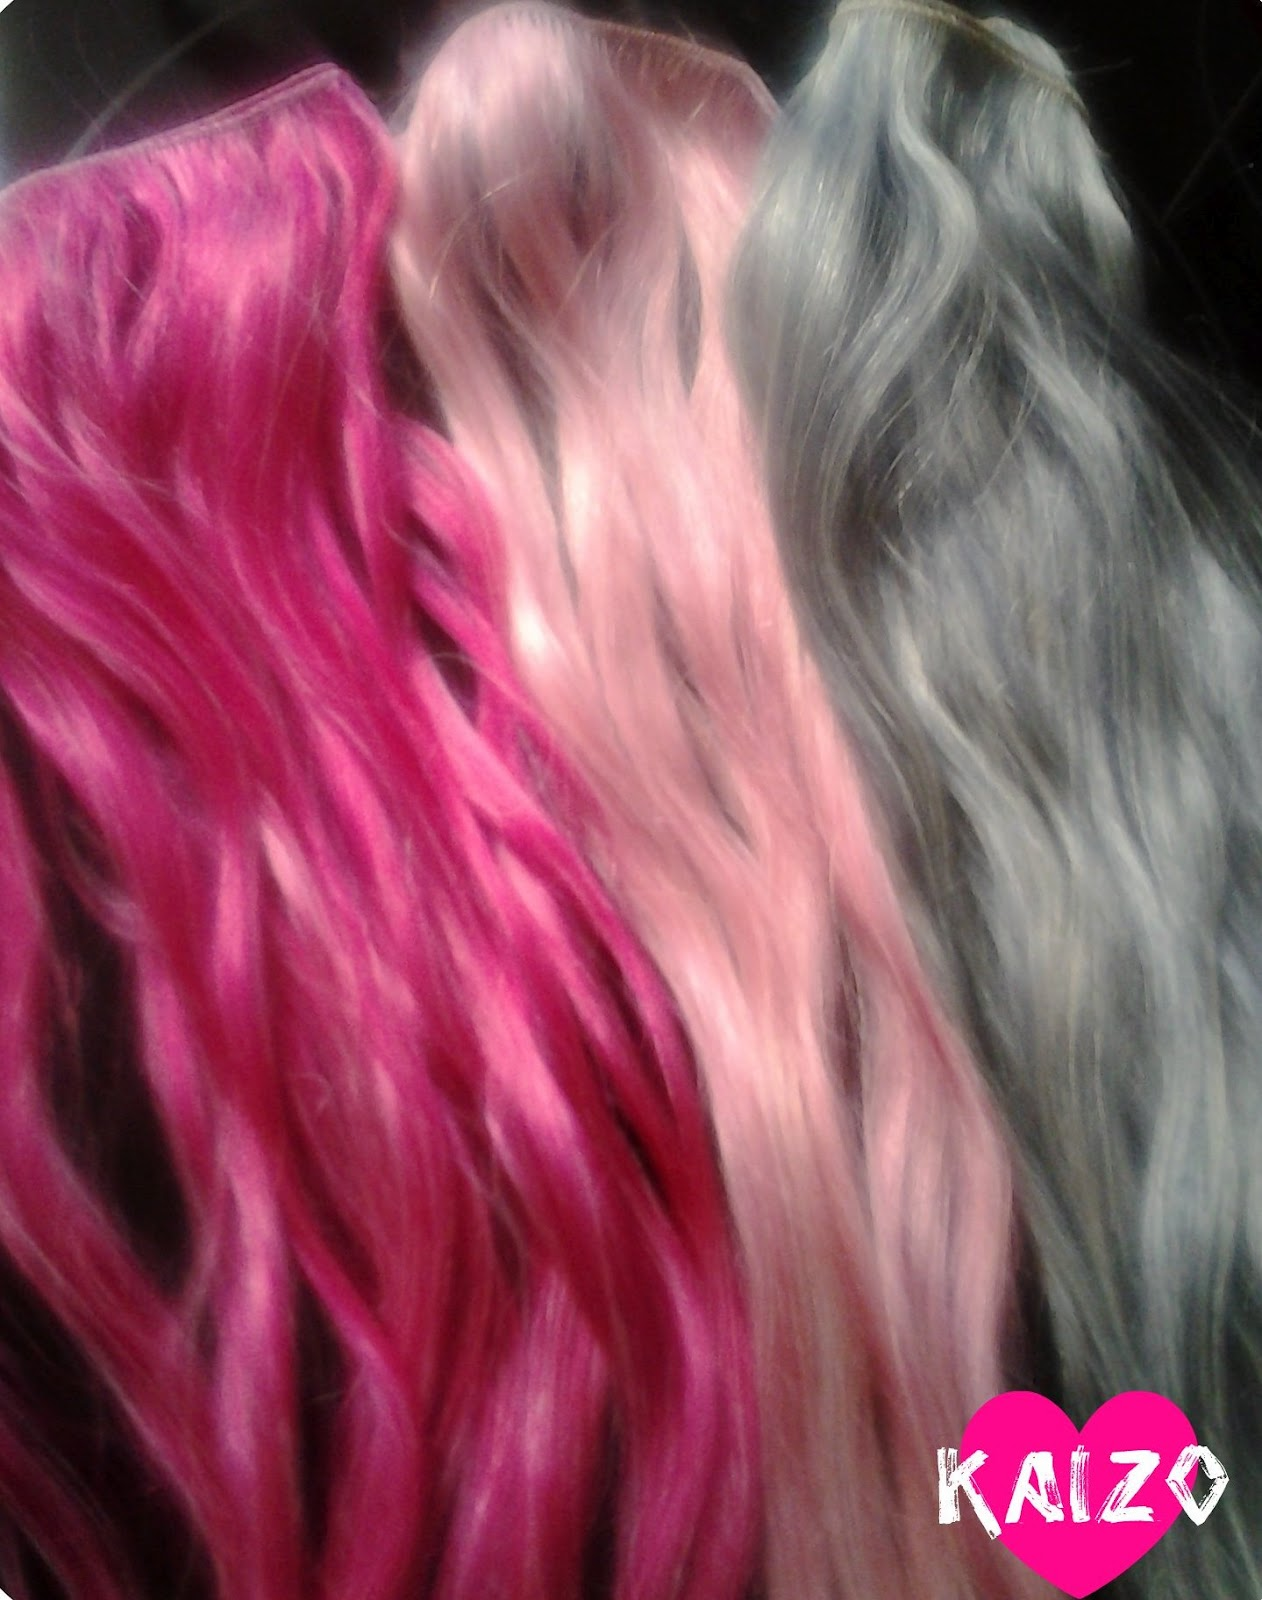 Pravana Hair Color Remover Kit Hair Color 20162017